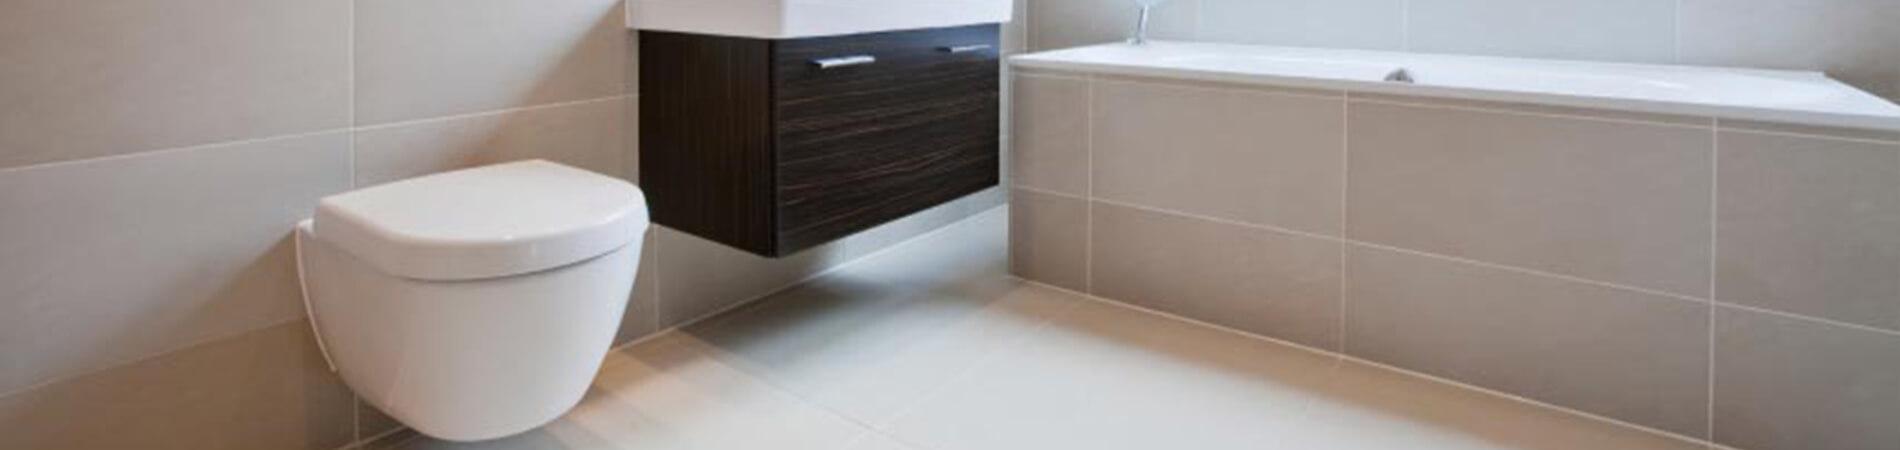 SallePose Installation Remplacement WC Suspendu Toilette Sanary de Bain Travaux de Carrelage Faïence Pose Installation Sanary